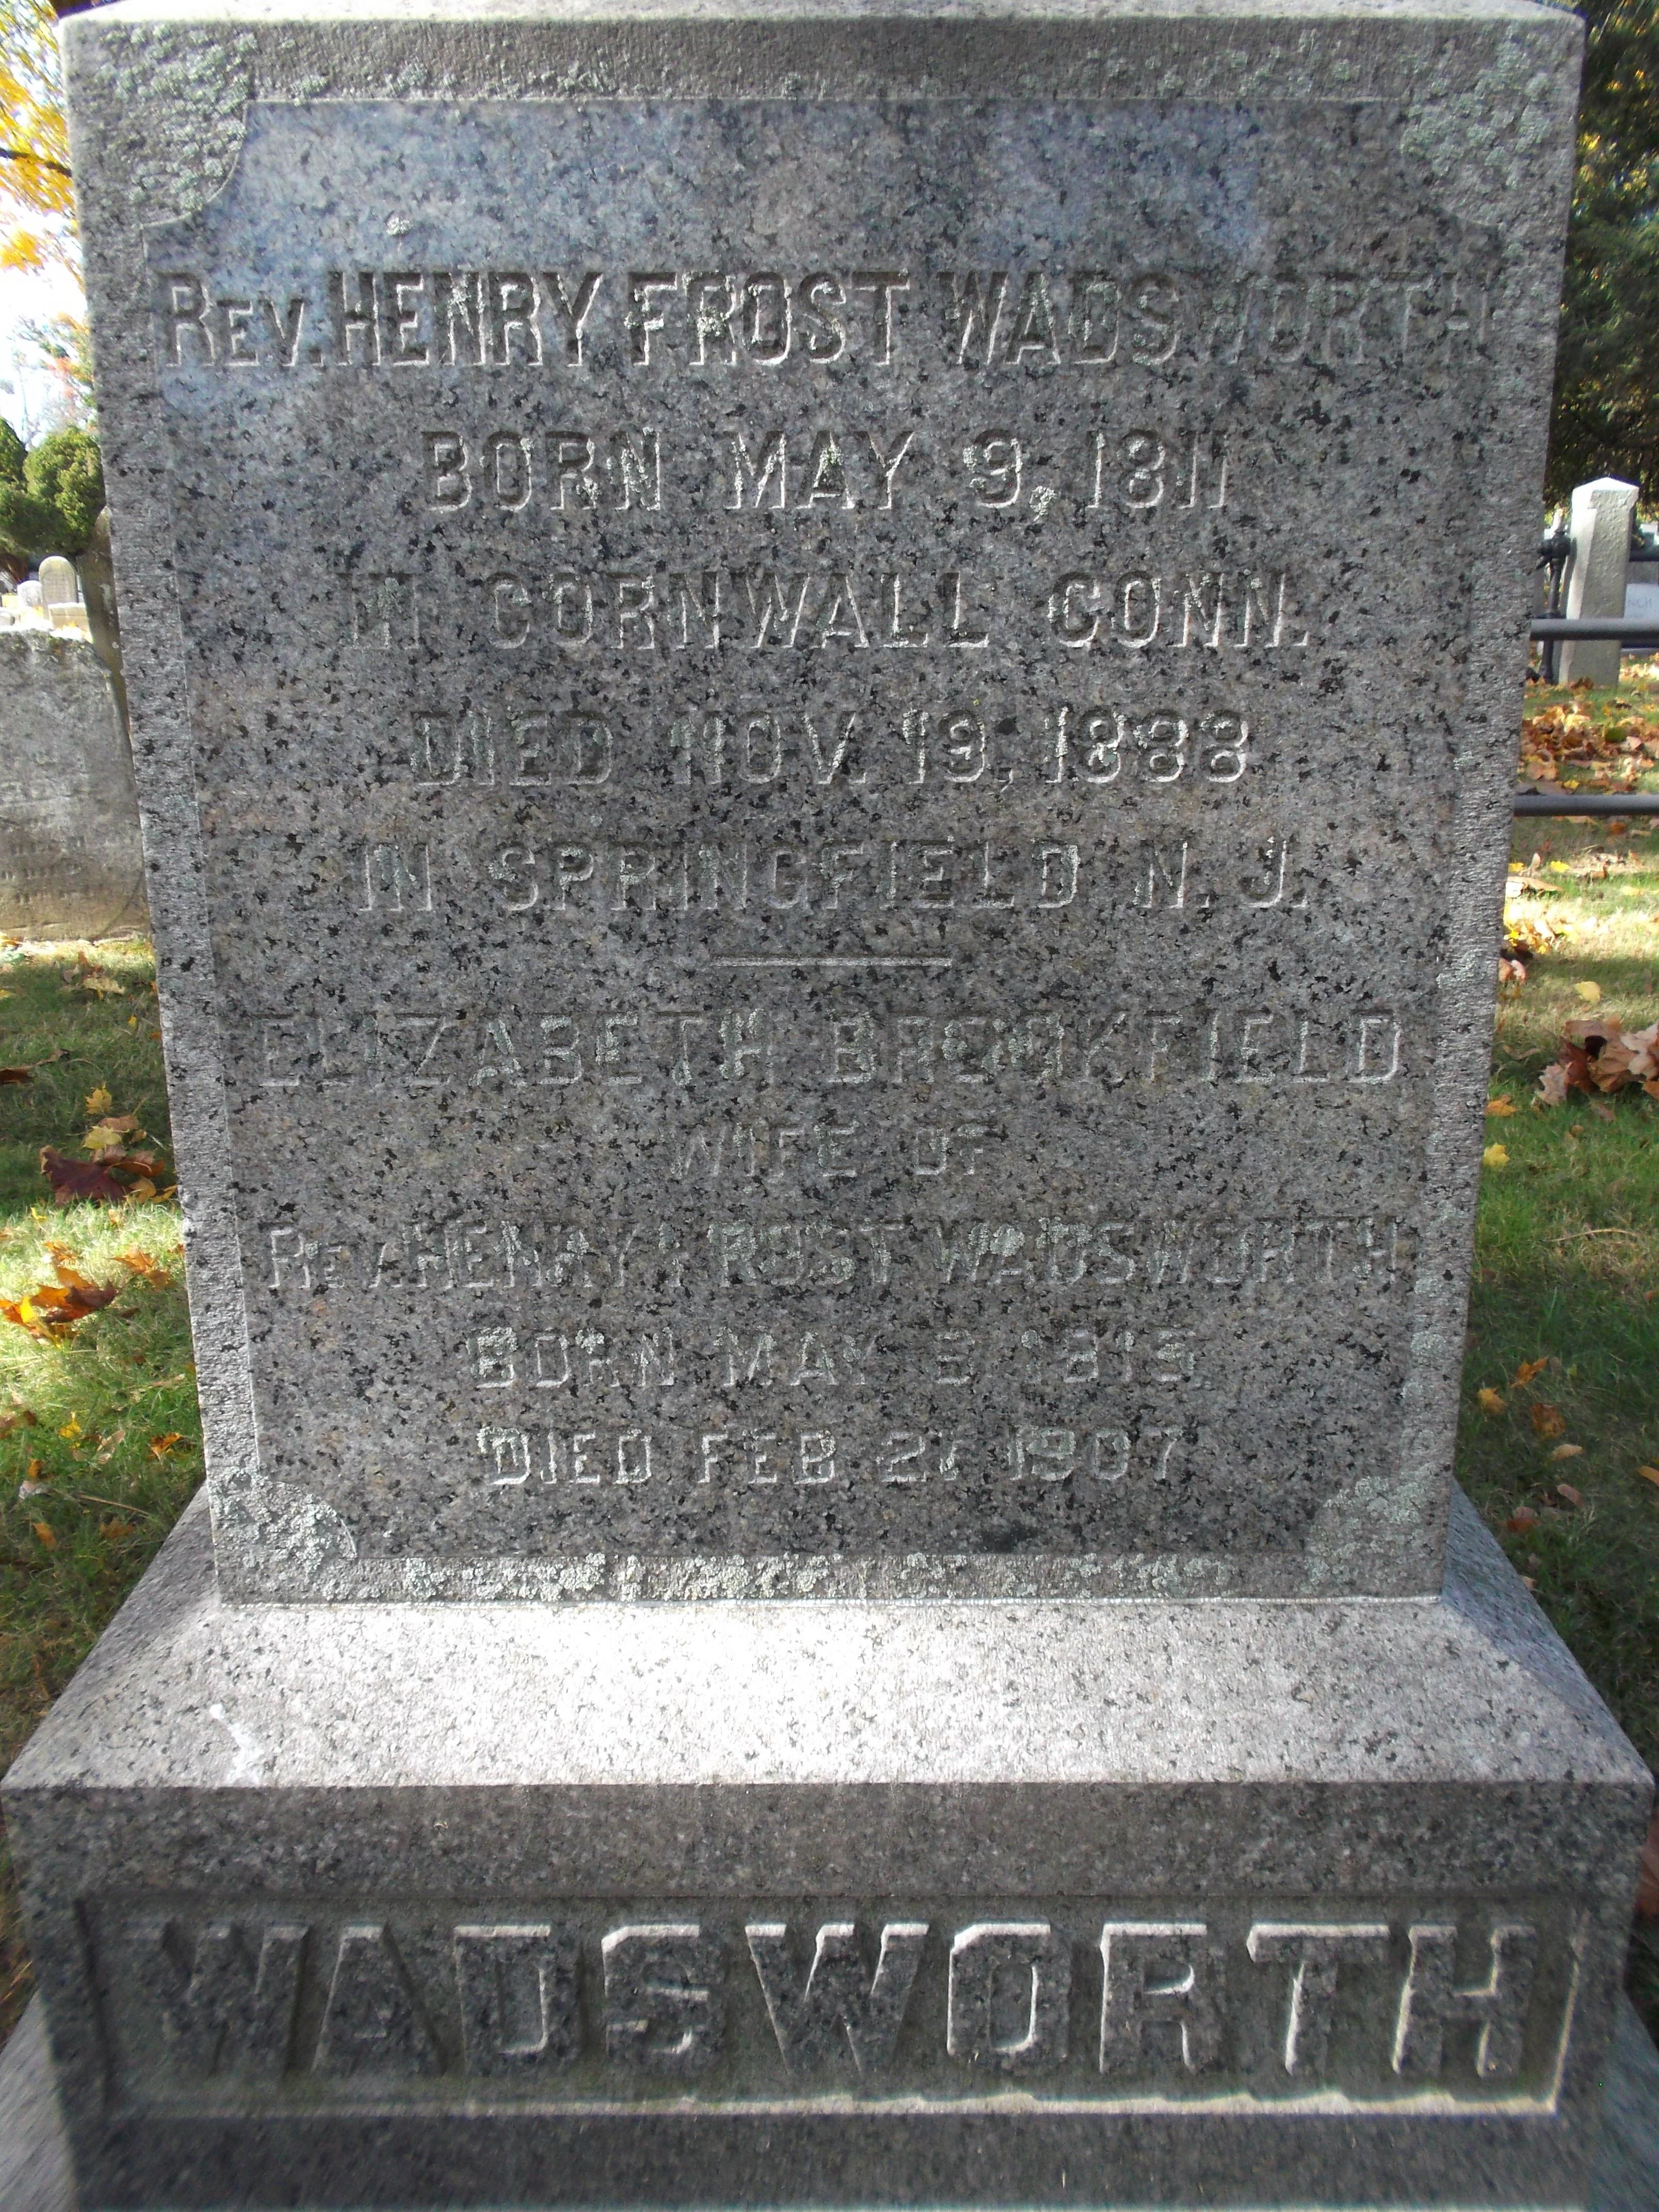 Rev. Henry Frost Wadsworth